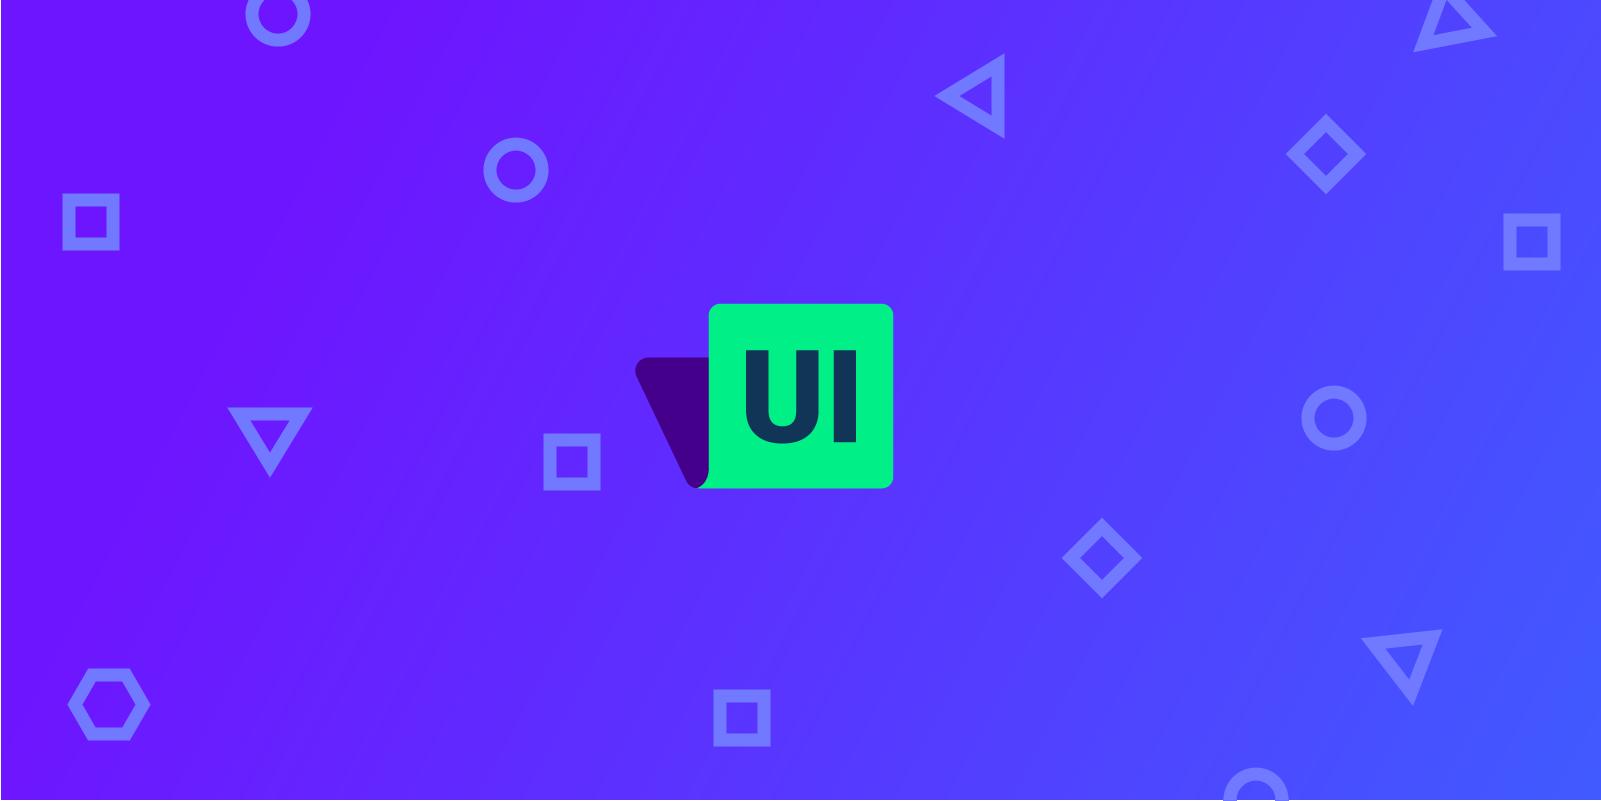 Des1gnON - Como aprender UI Design do ZERO